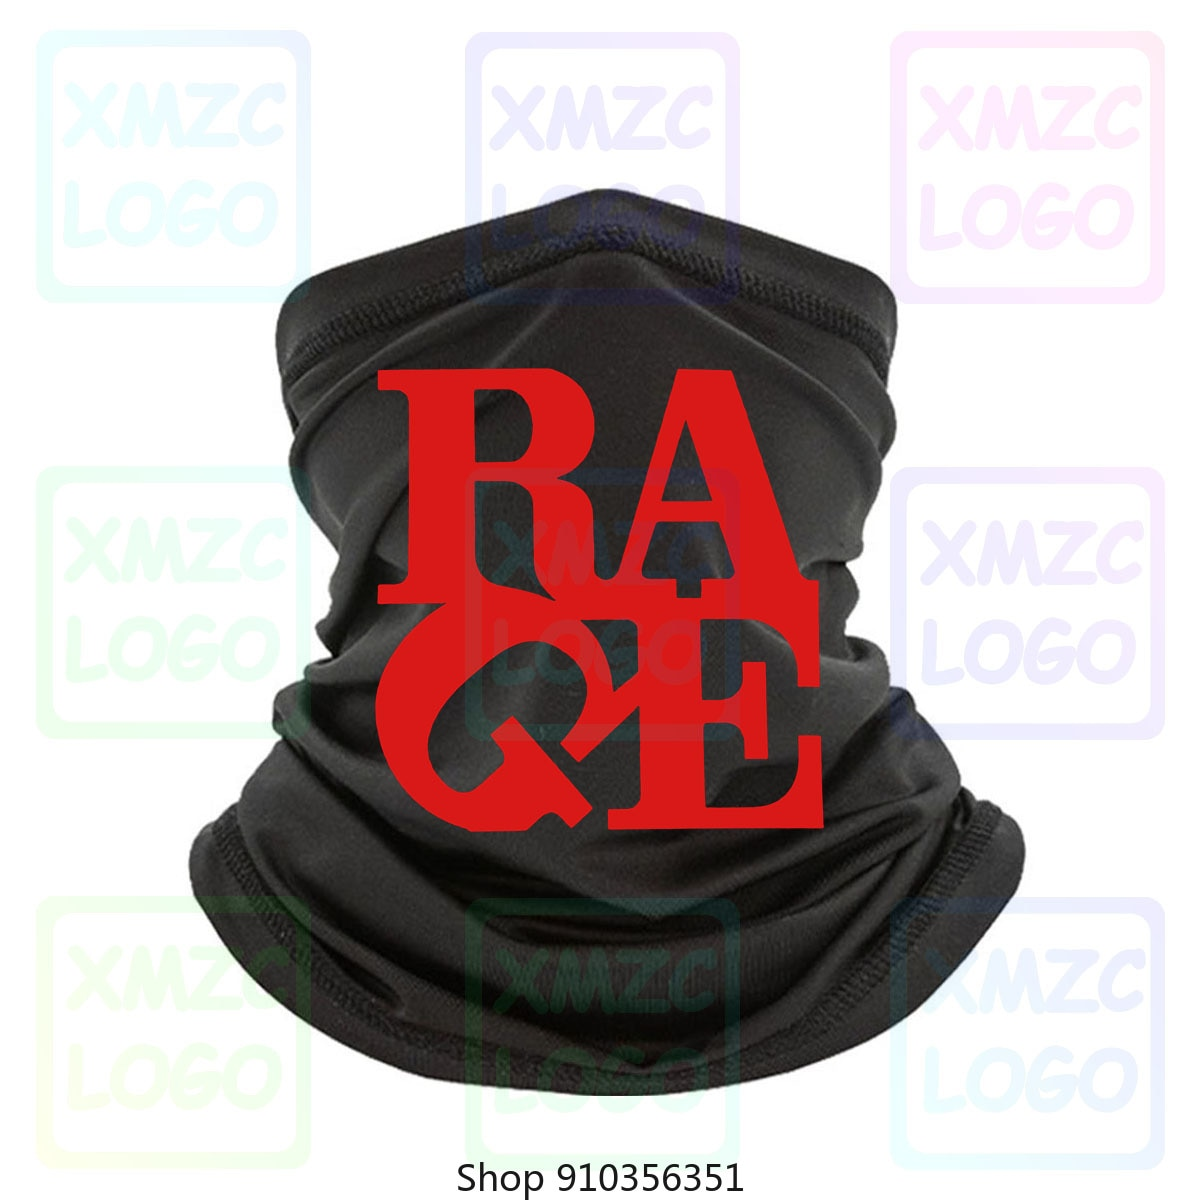 Новая рок-группа Rage Against The Machine Renegades, Мужская черная бандана, размер s 3Xl, повязка на голову, шарф, повязка на шею, теплая Женская и мужская